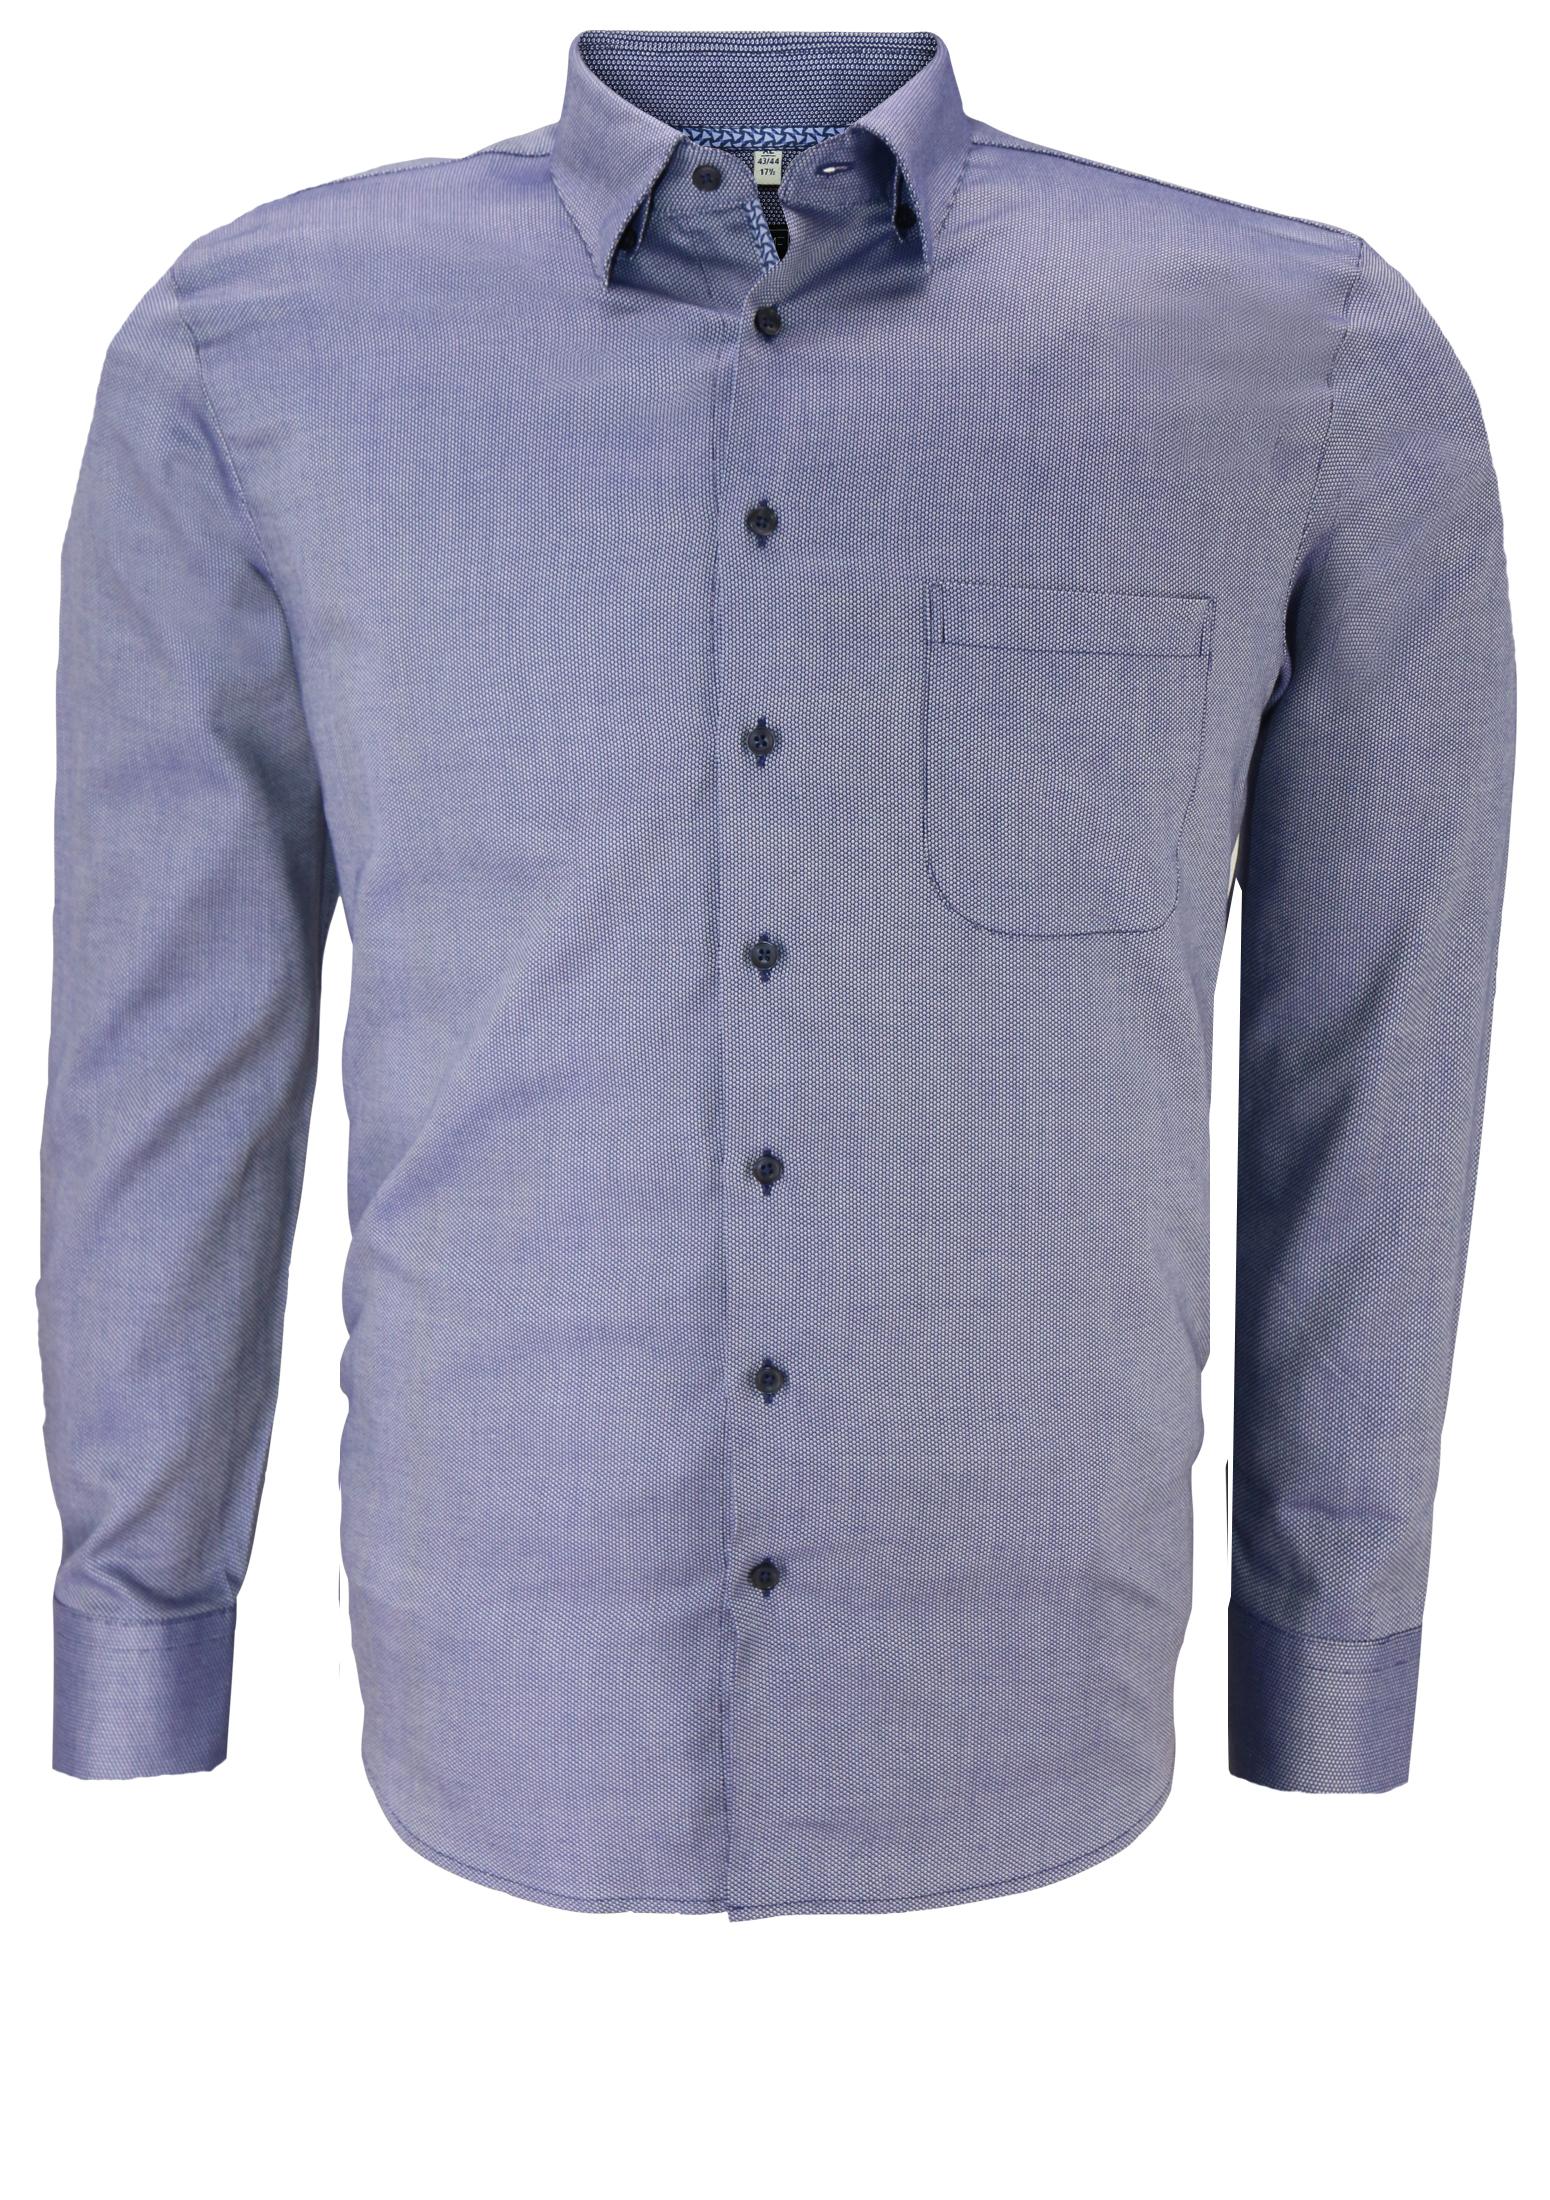 Het Overhemd.Melvinsi Overhemd 1xl 6xl Blauw Bestel Nu Bij Melvinsi